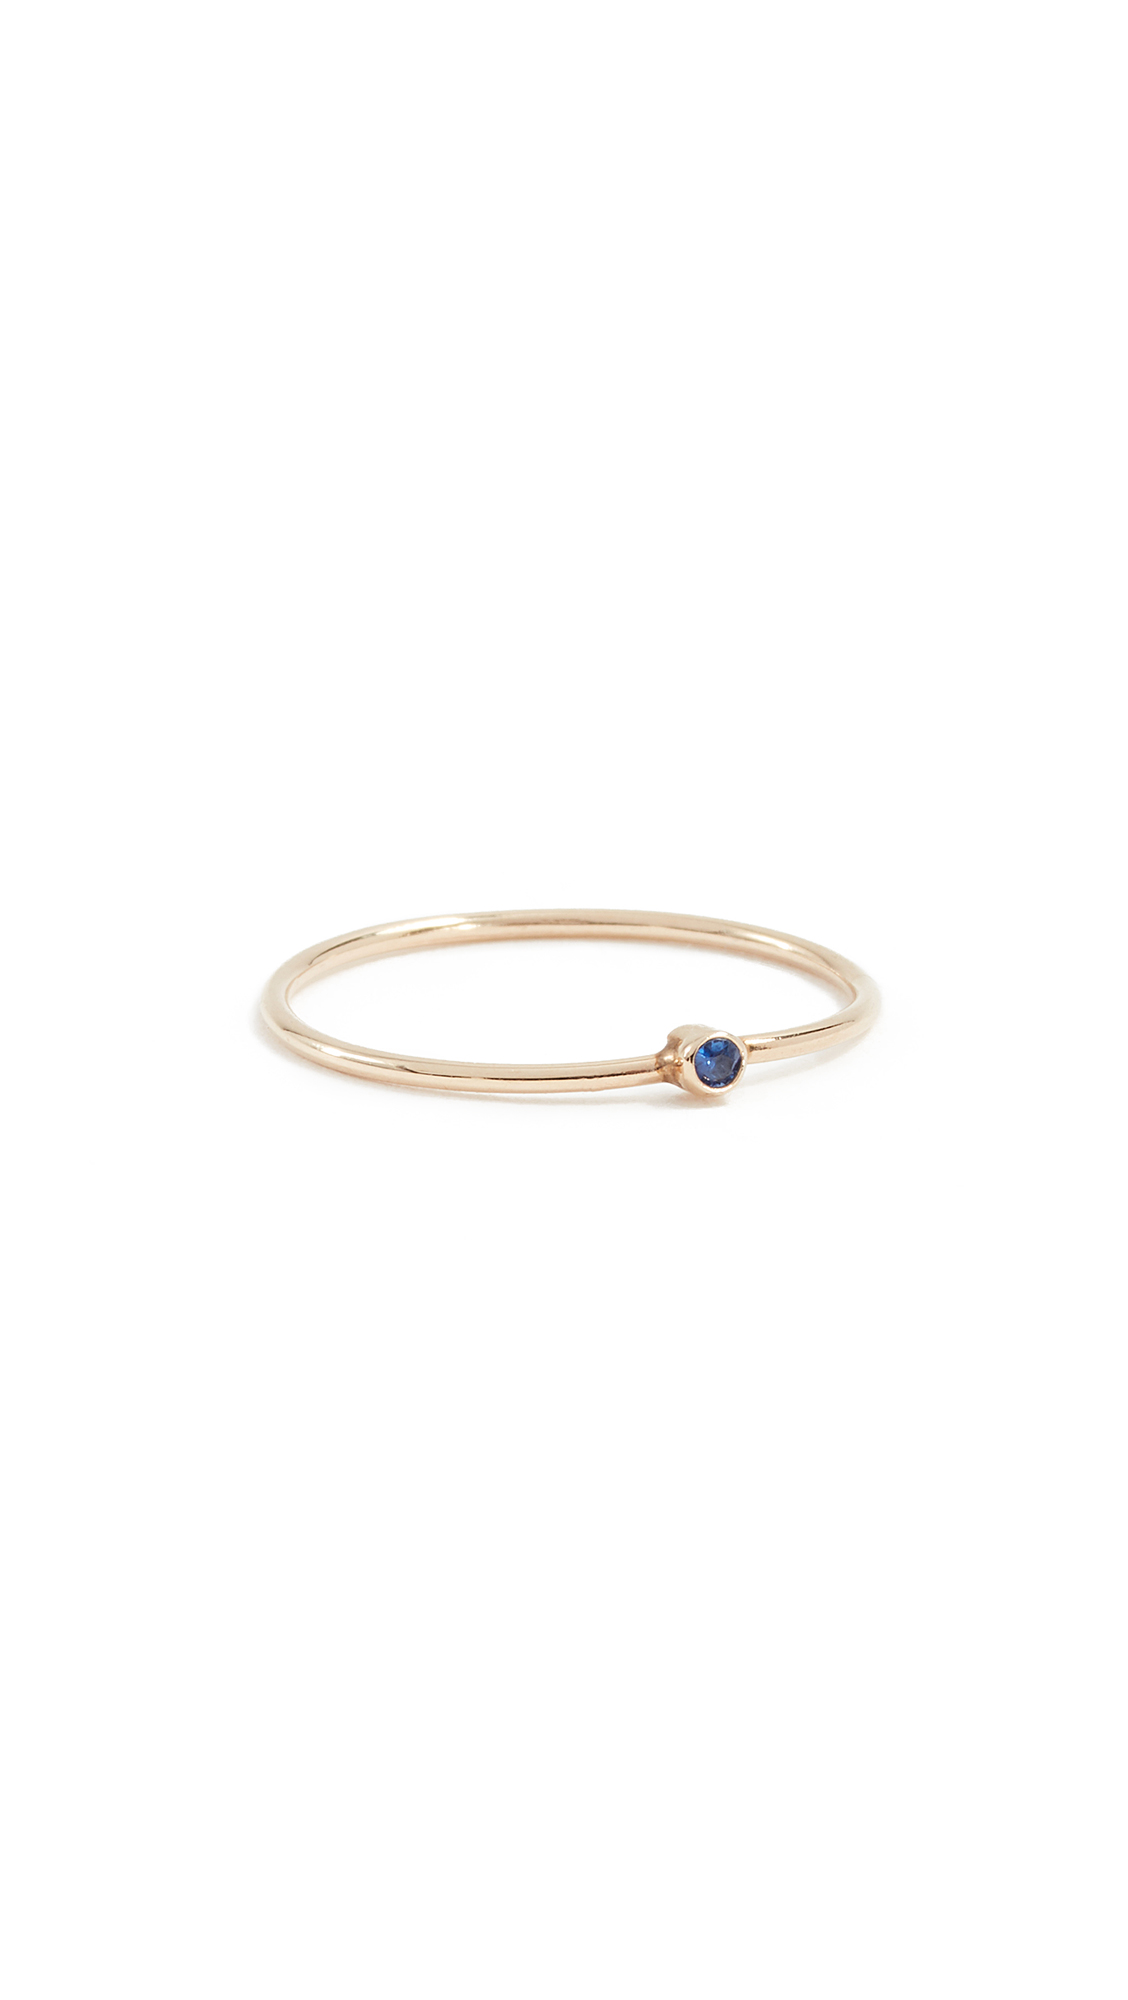 Jennifer Meyer Jewelry 18k Gold Thin Ring with Sapphire - Sapphire